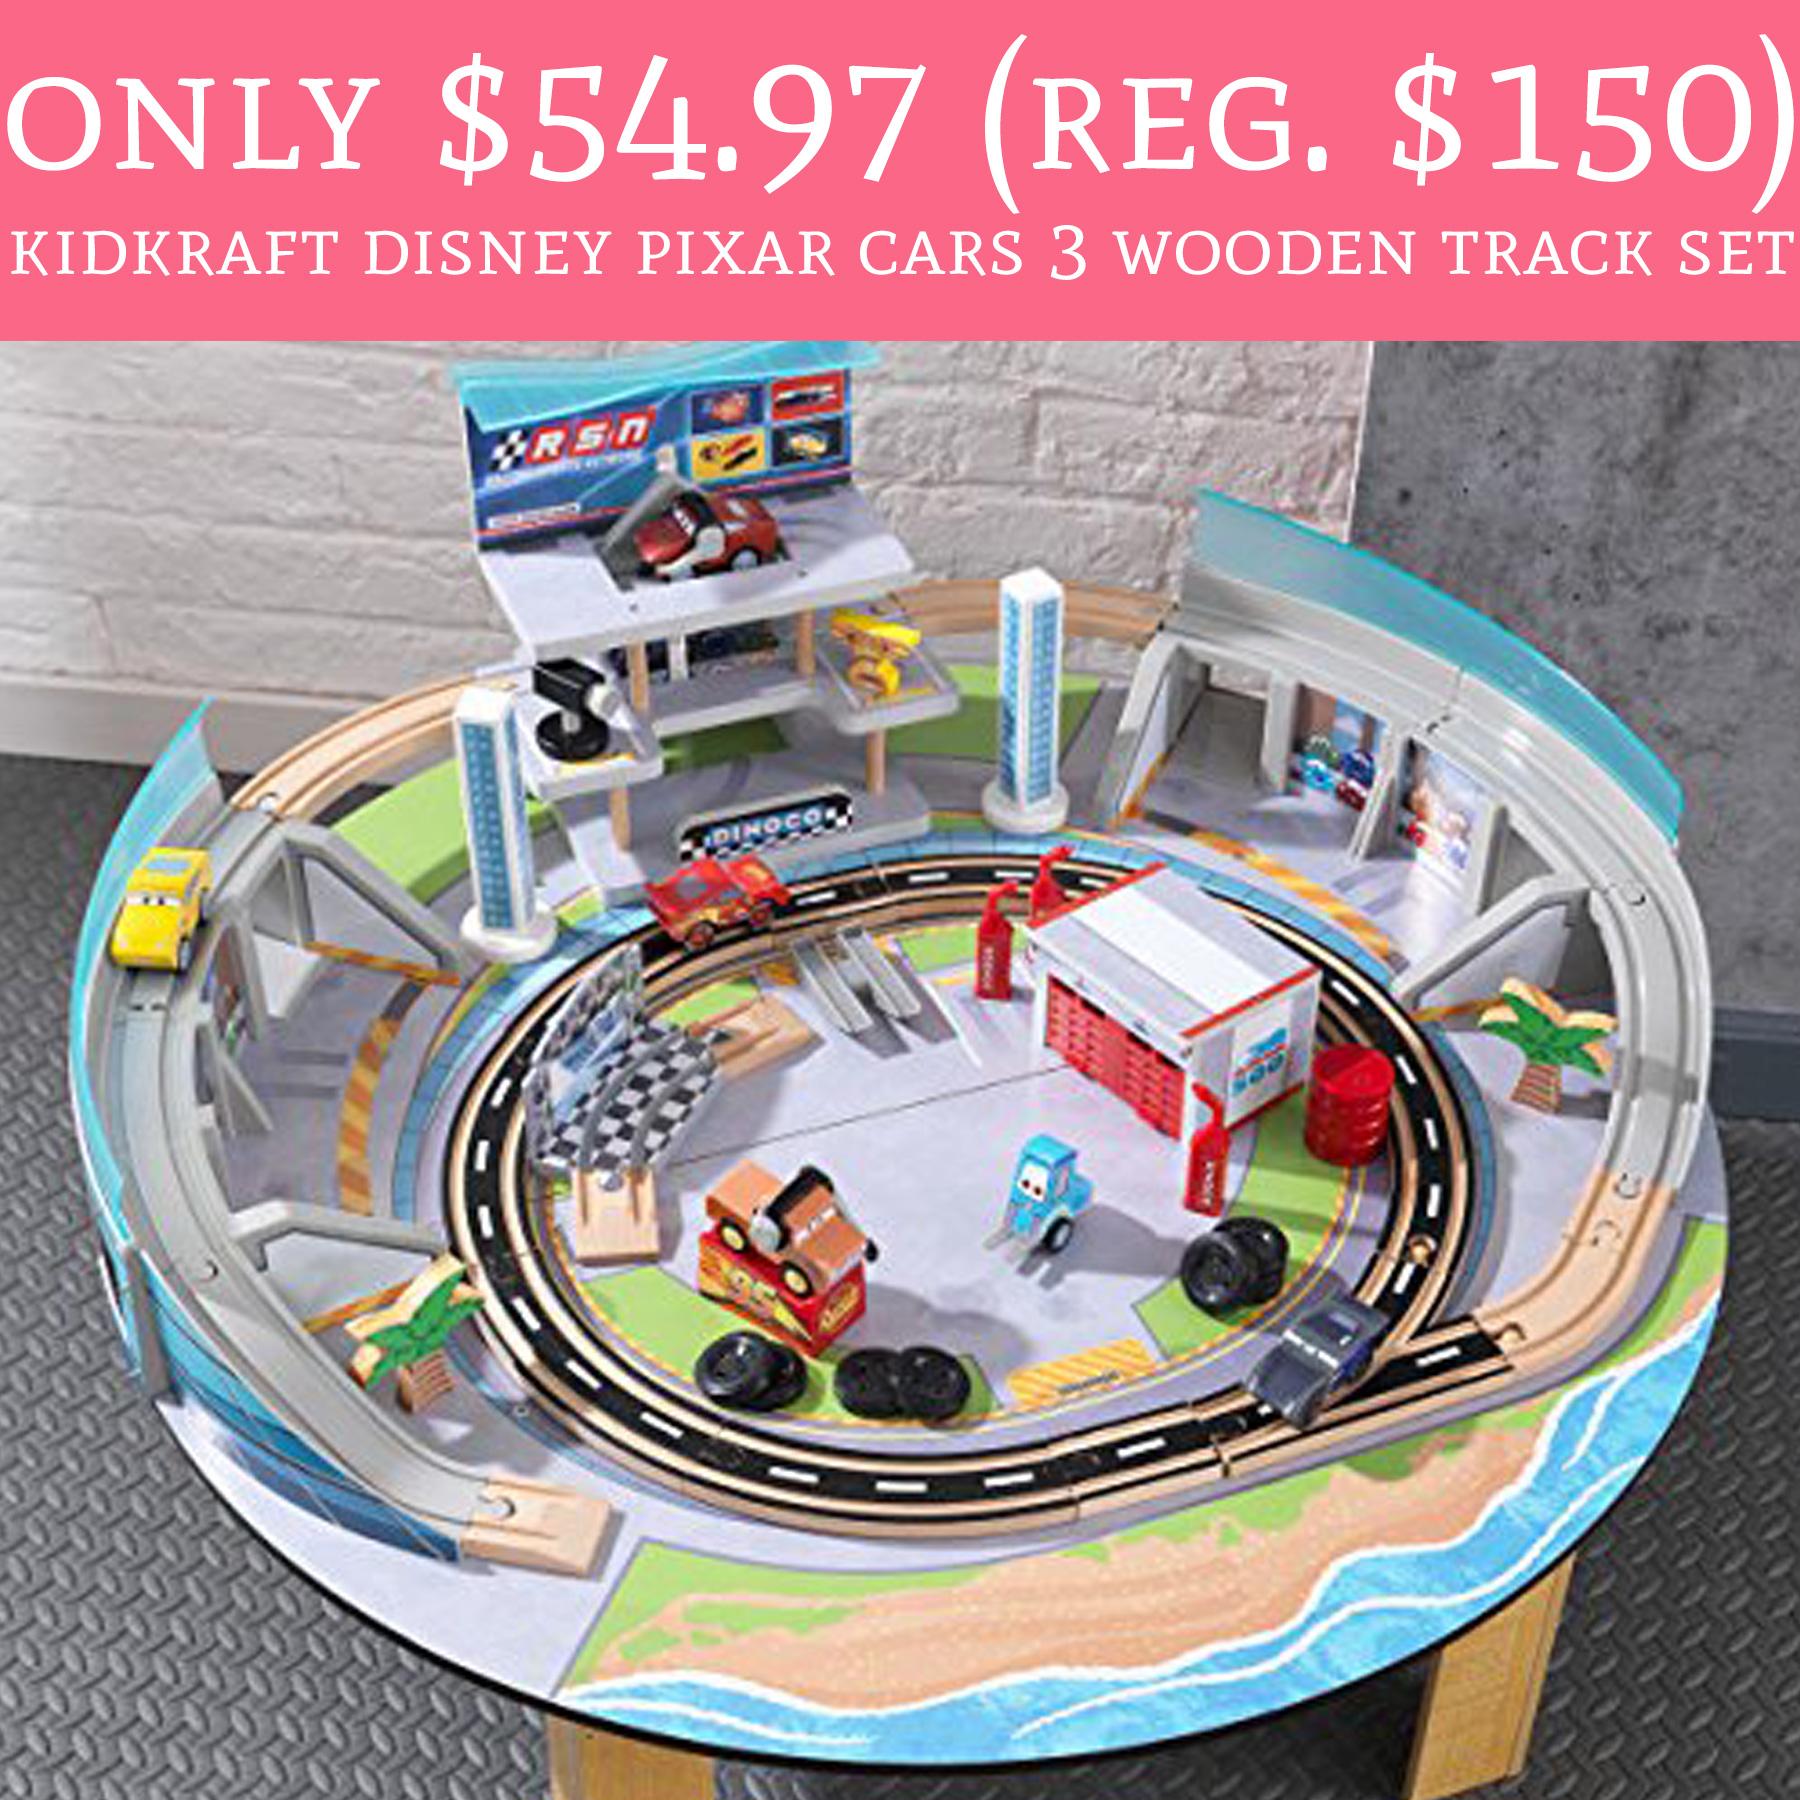 Kidkraft Disney Pixar Cars 3 Wooden Track Set Deal Hunting Babe